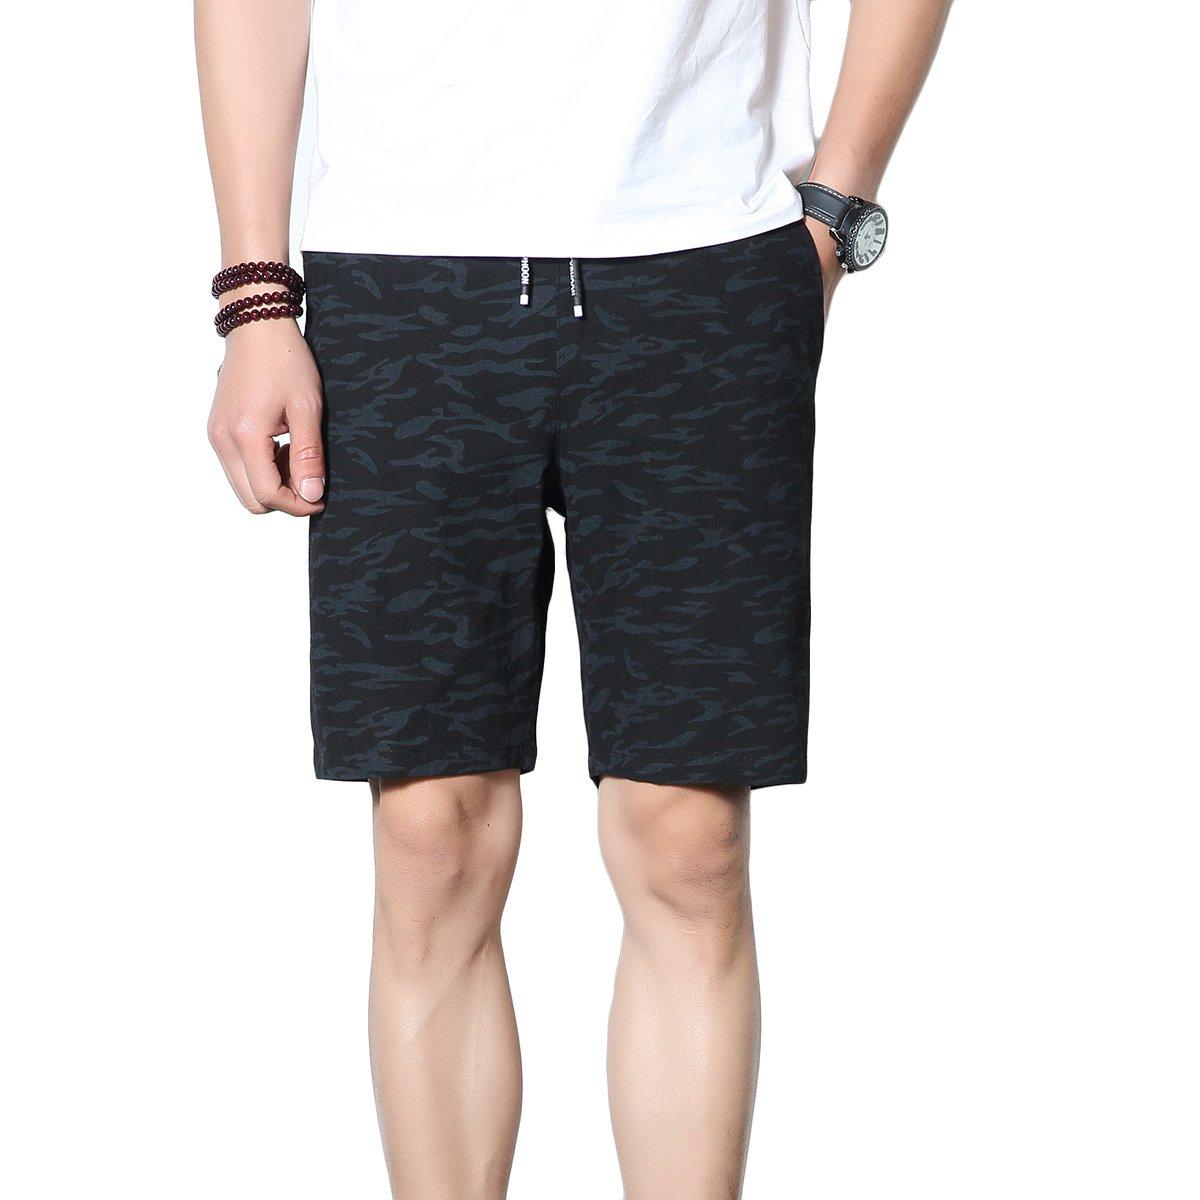 KaiDi Men's Summer Board Shorts Quick Dry Beach Shorts Swim Trunks with Pockets (XS, 2# Black)